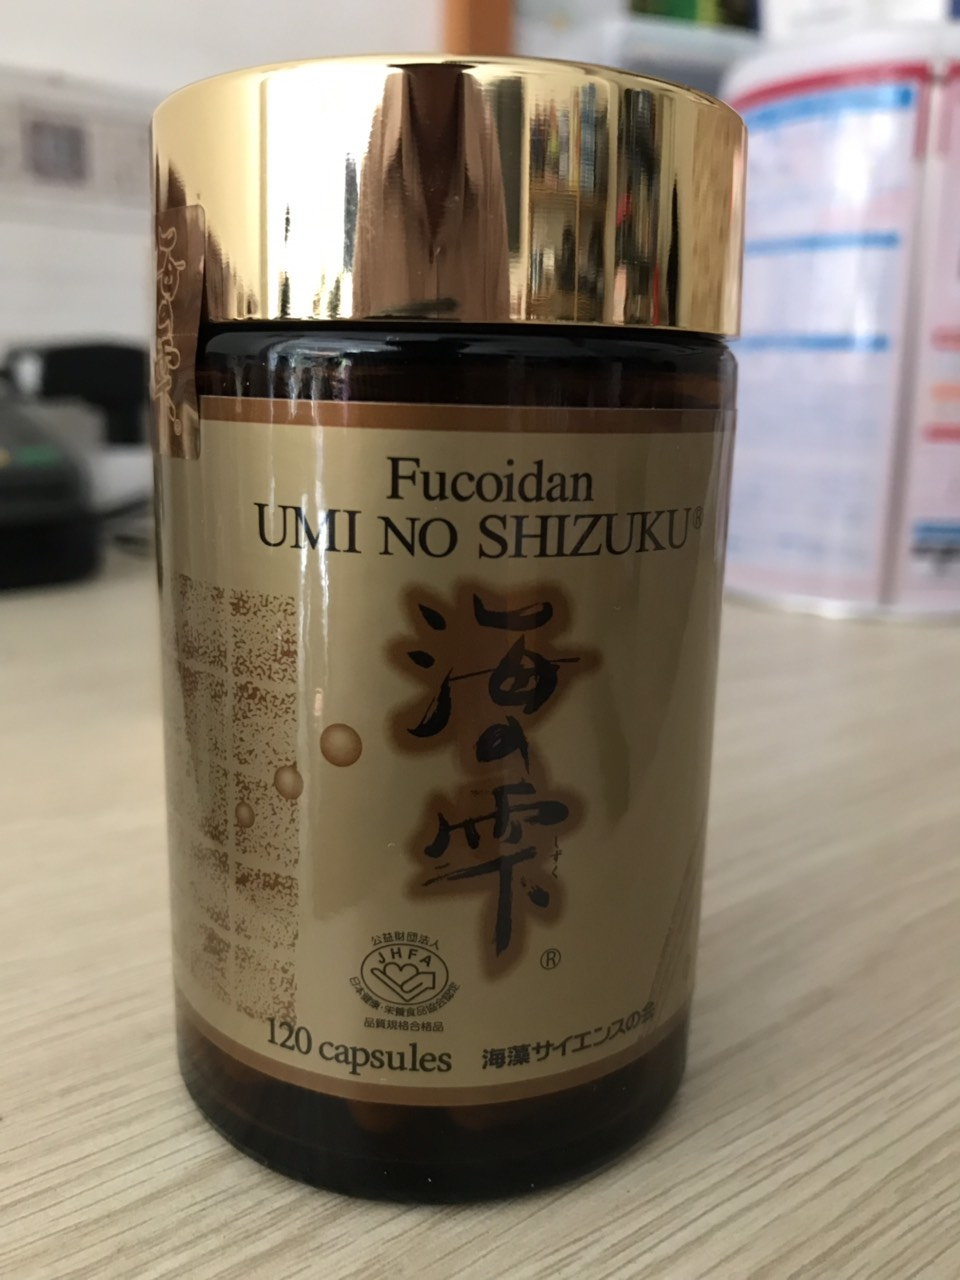 ThuốcFucoidan Nhật Bản